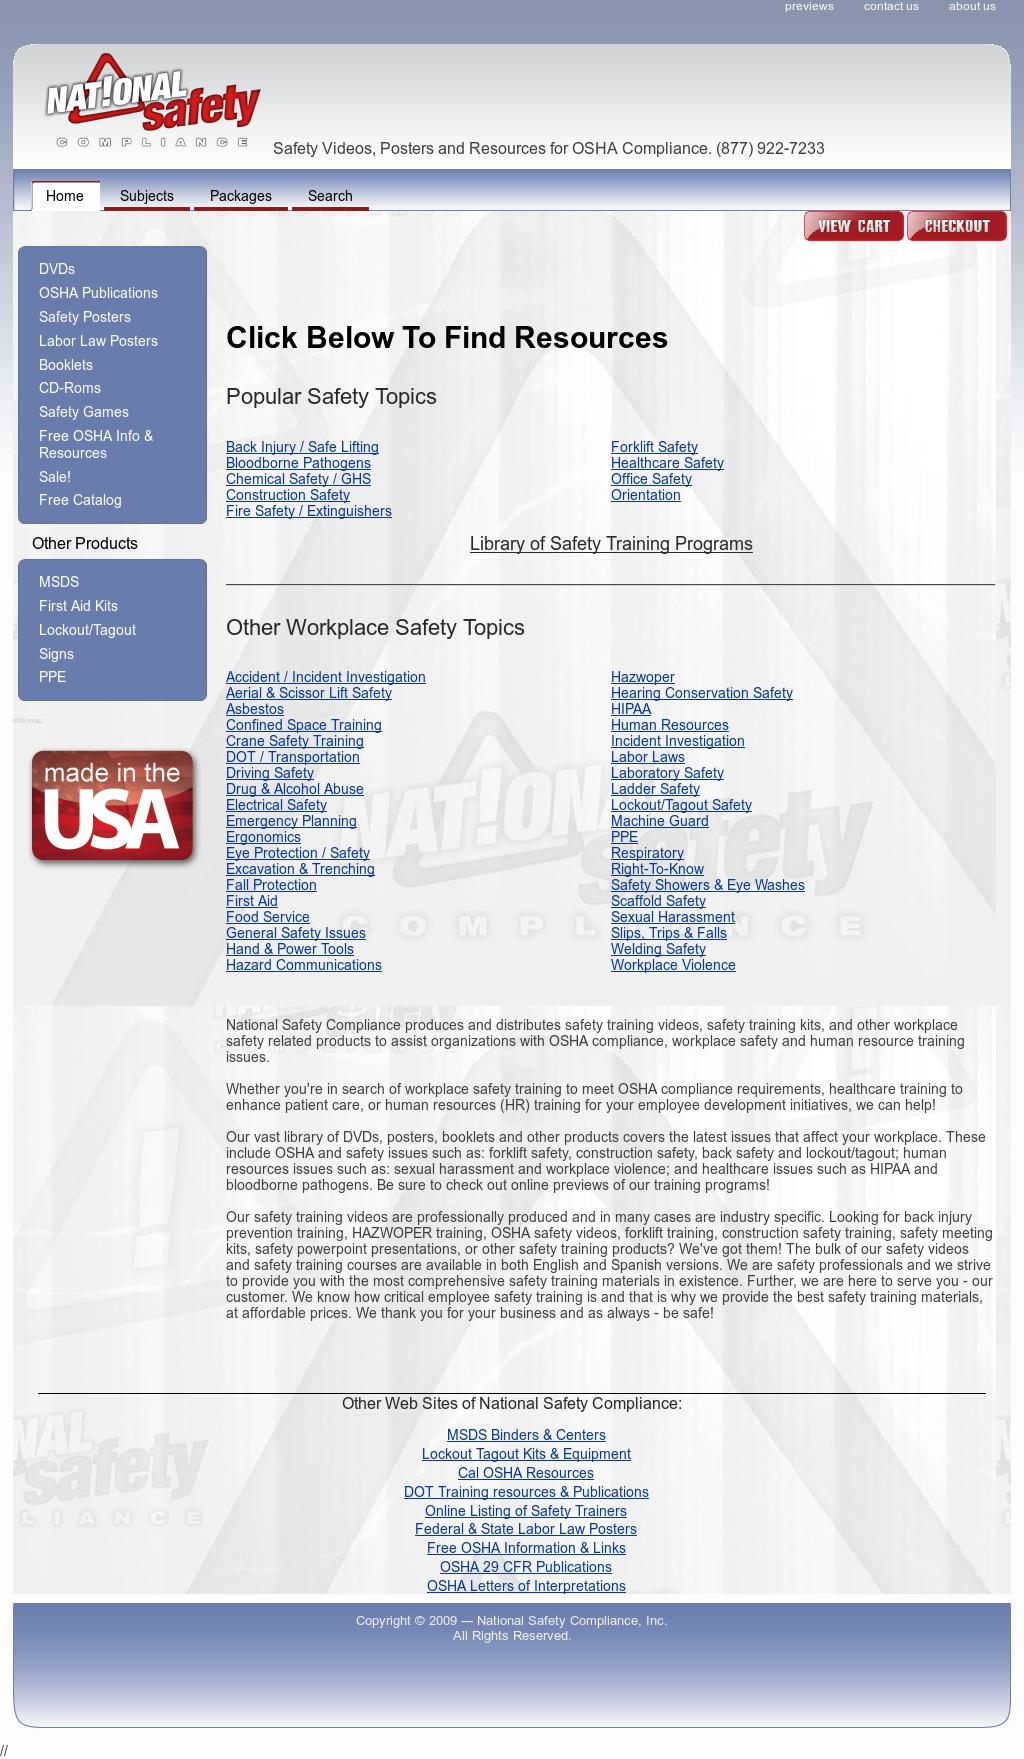 Osha Safety Training Competitors, Revenue and Employees